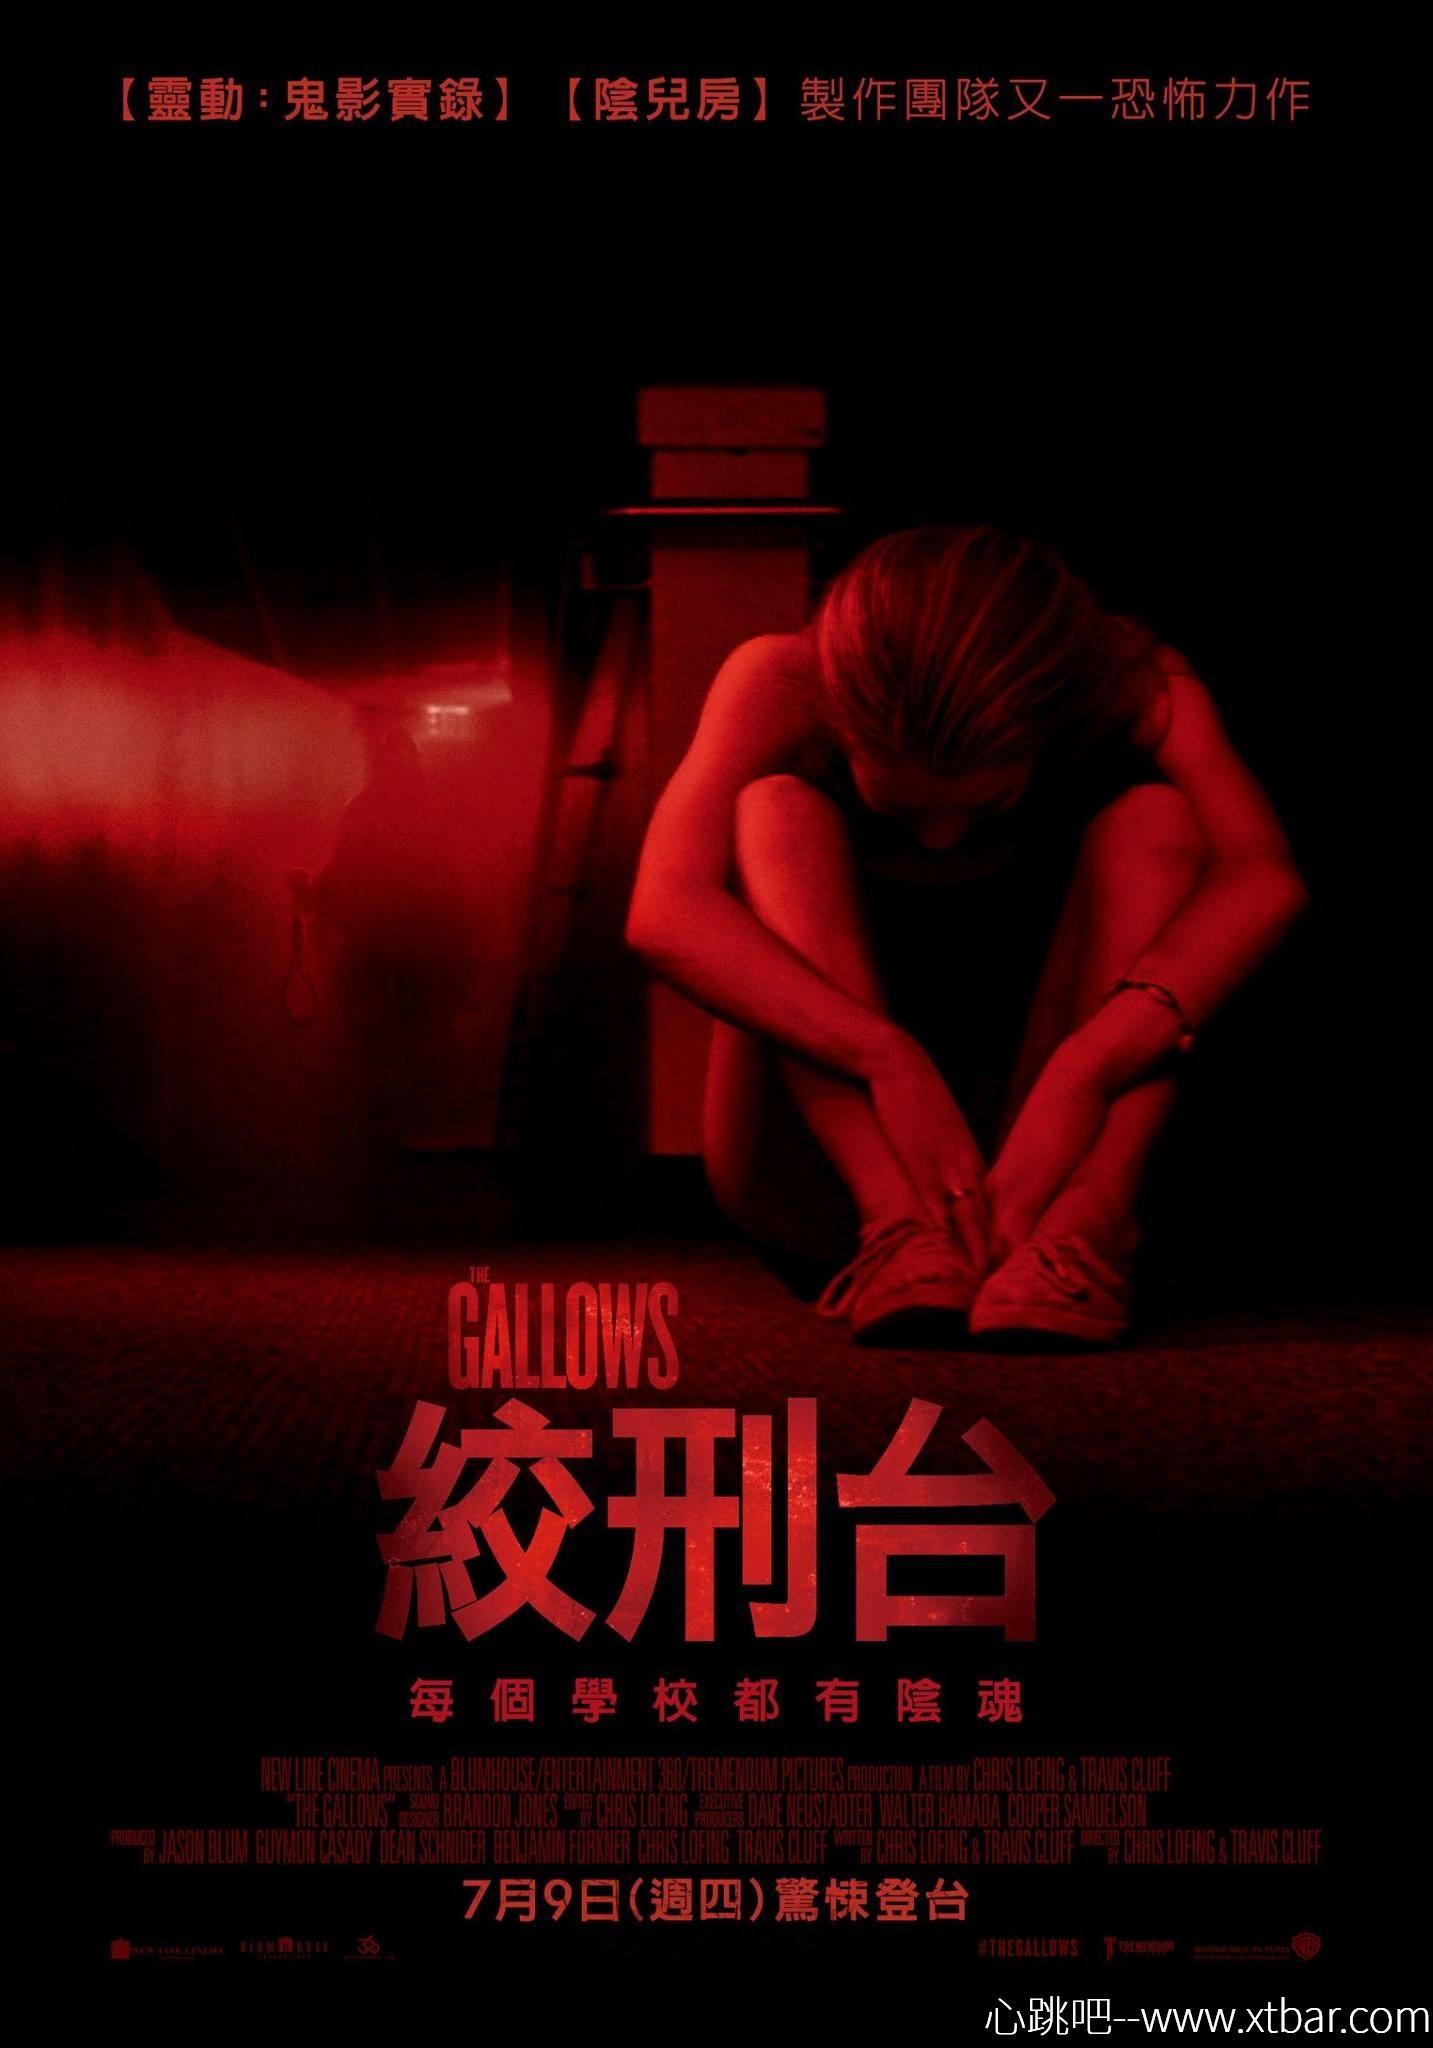 0085j6oIly1ghaytkw4i9j313t1kwq7w - 周六恐怖片推荐:《绞刑架》,认真演戏就会死!